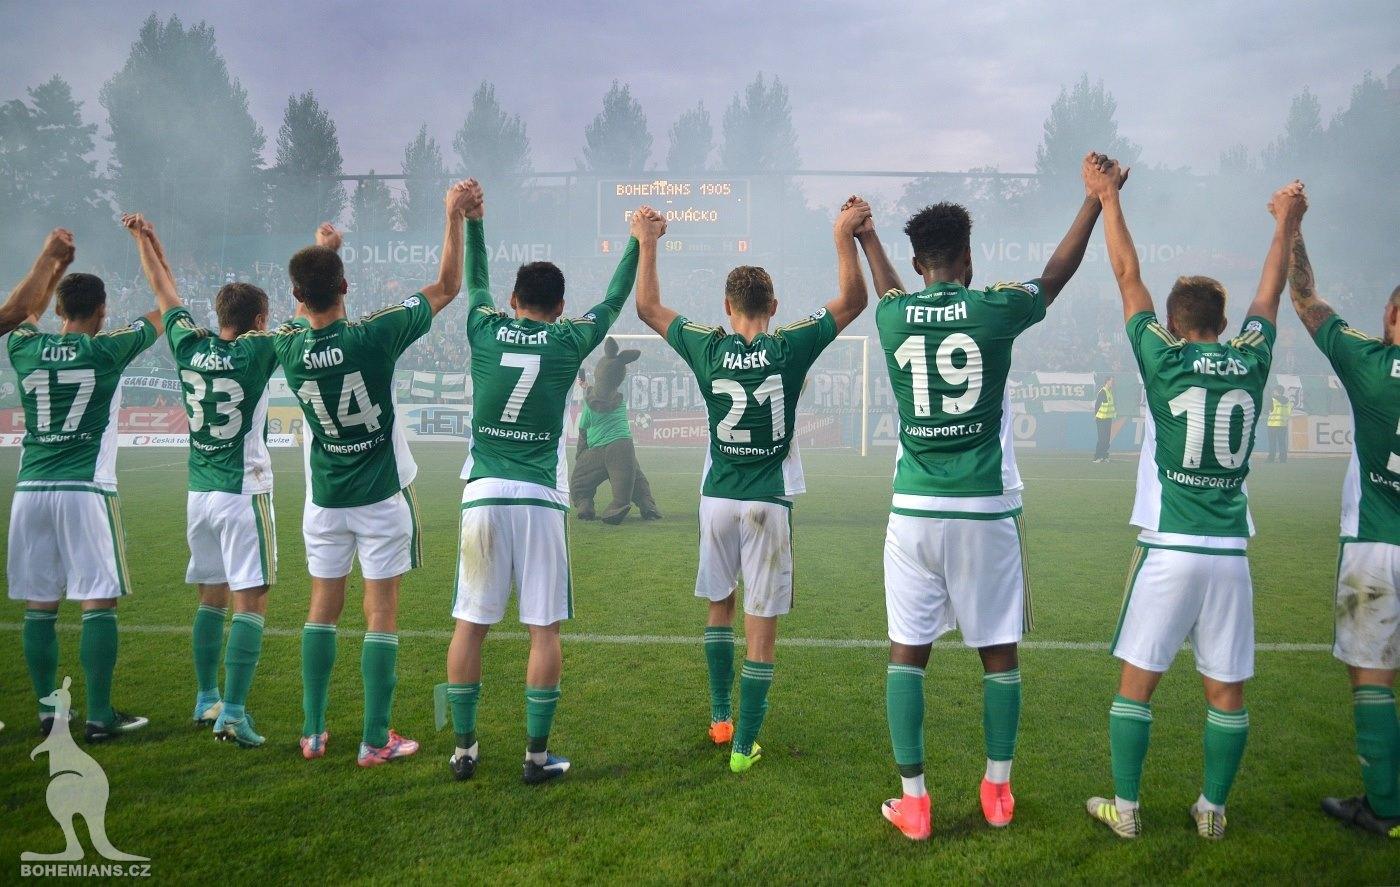 Bohemians Praha 1905 – 1. FC Slovácko 1:0